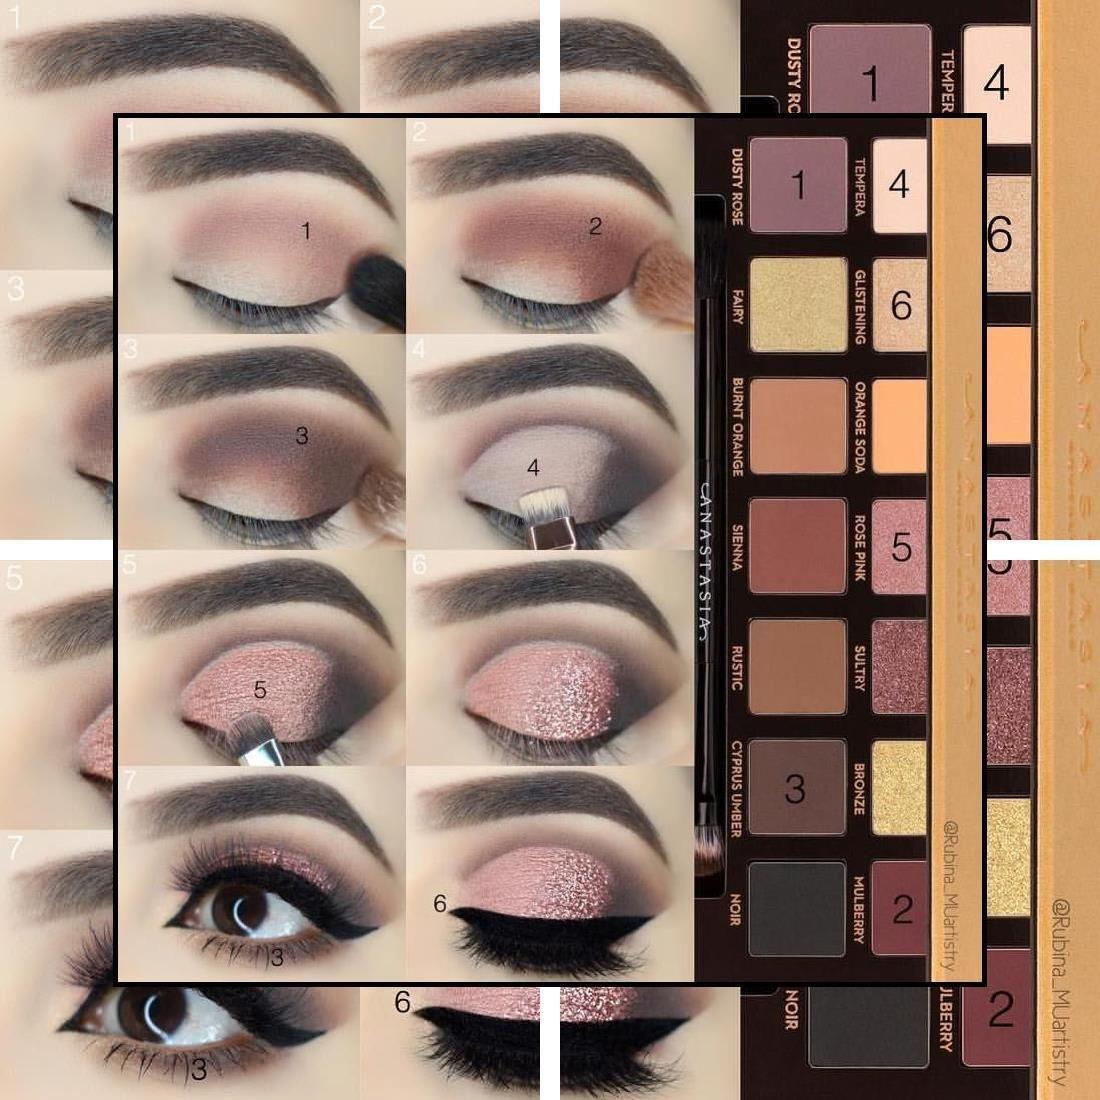 Gel Liner | Pencil Eyeliner Price | A Good Eyeliner Gel Liner | Pencil Eyeliner Price | A Good Eyel